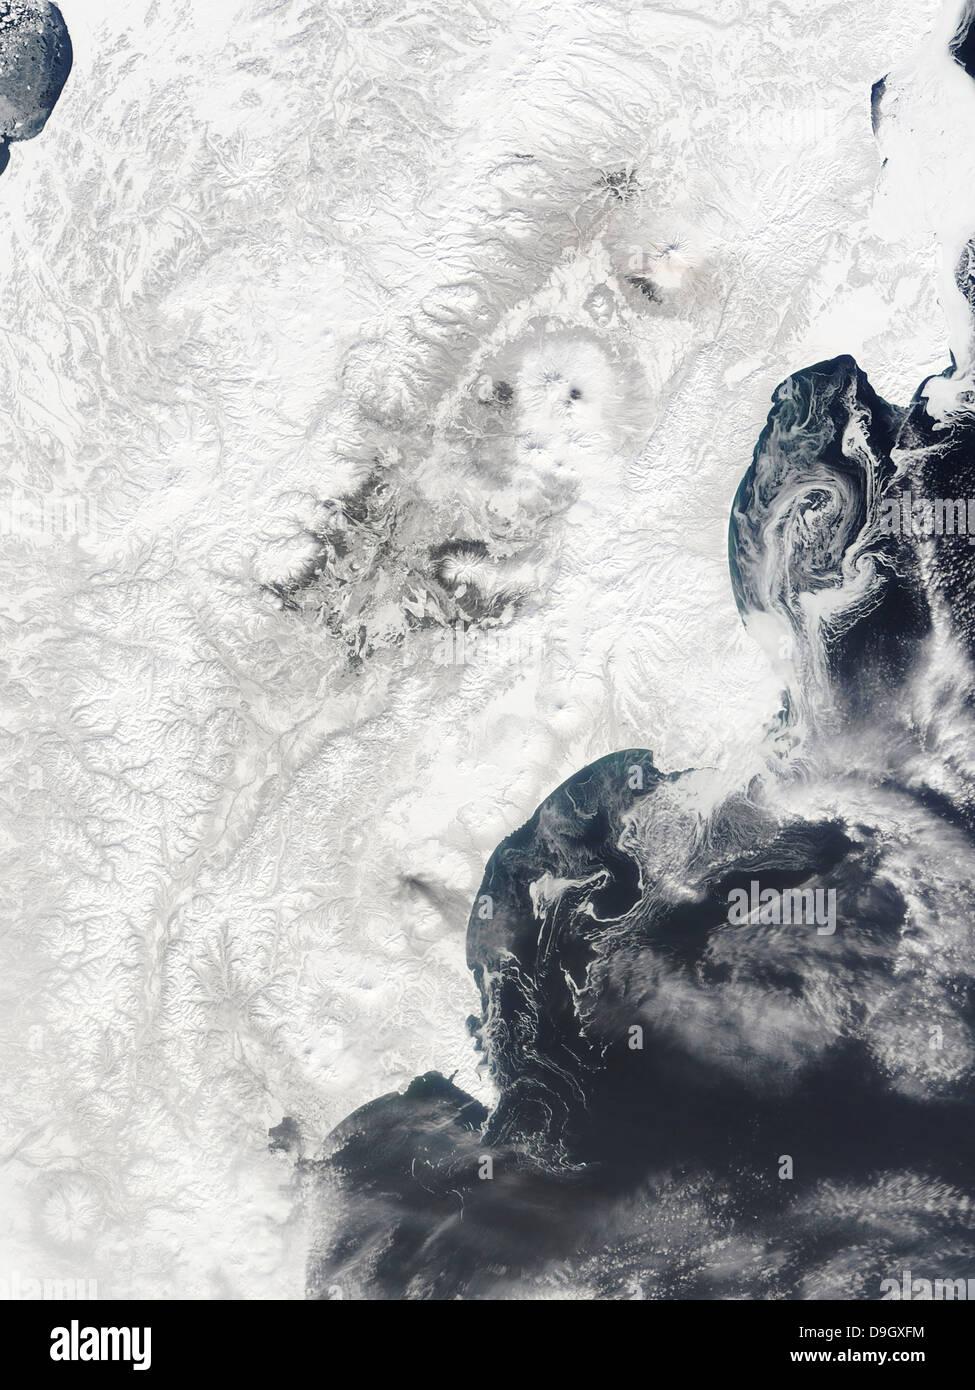 April 2, 2010 - Volcanoes in central Kamchatka Peninsula, eastern Russia. Stock Photo